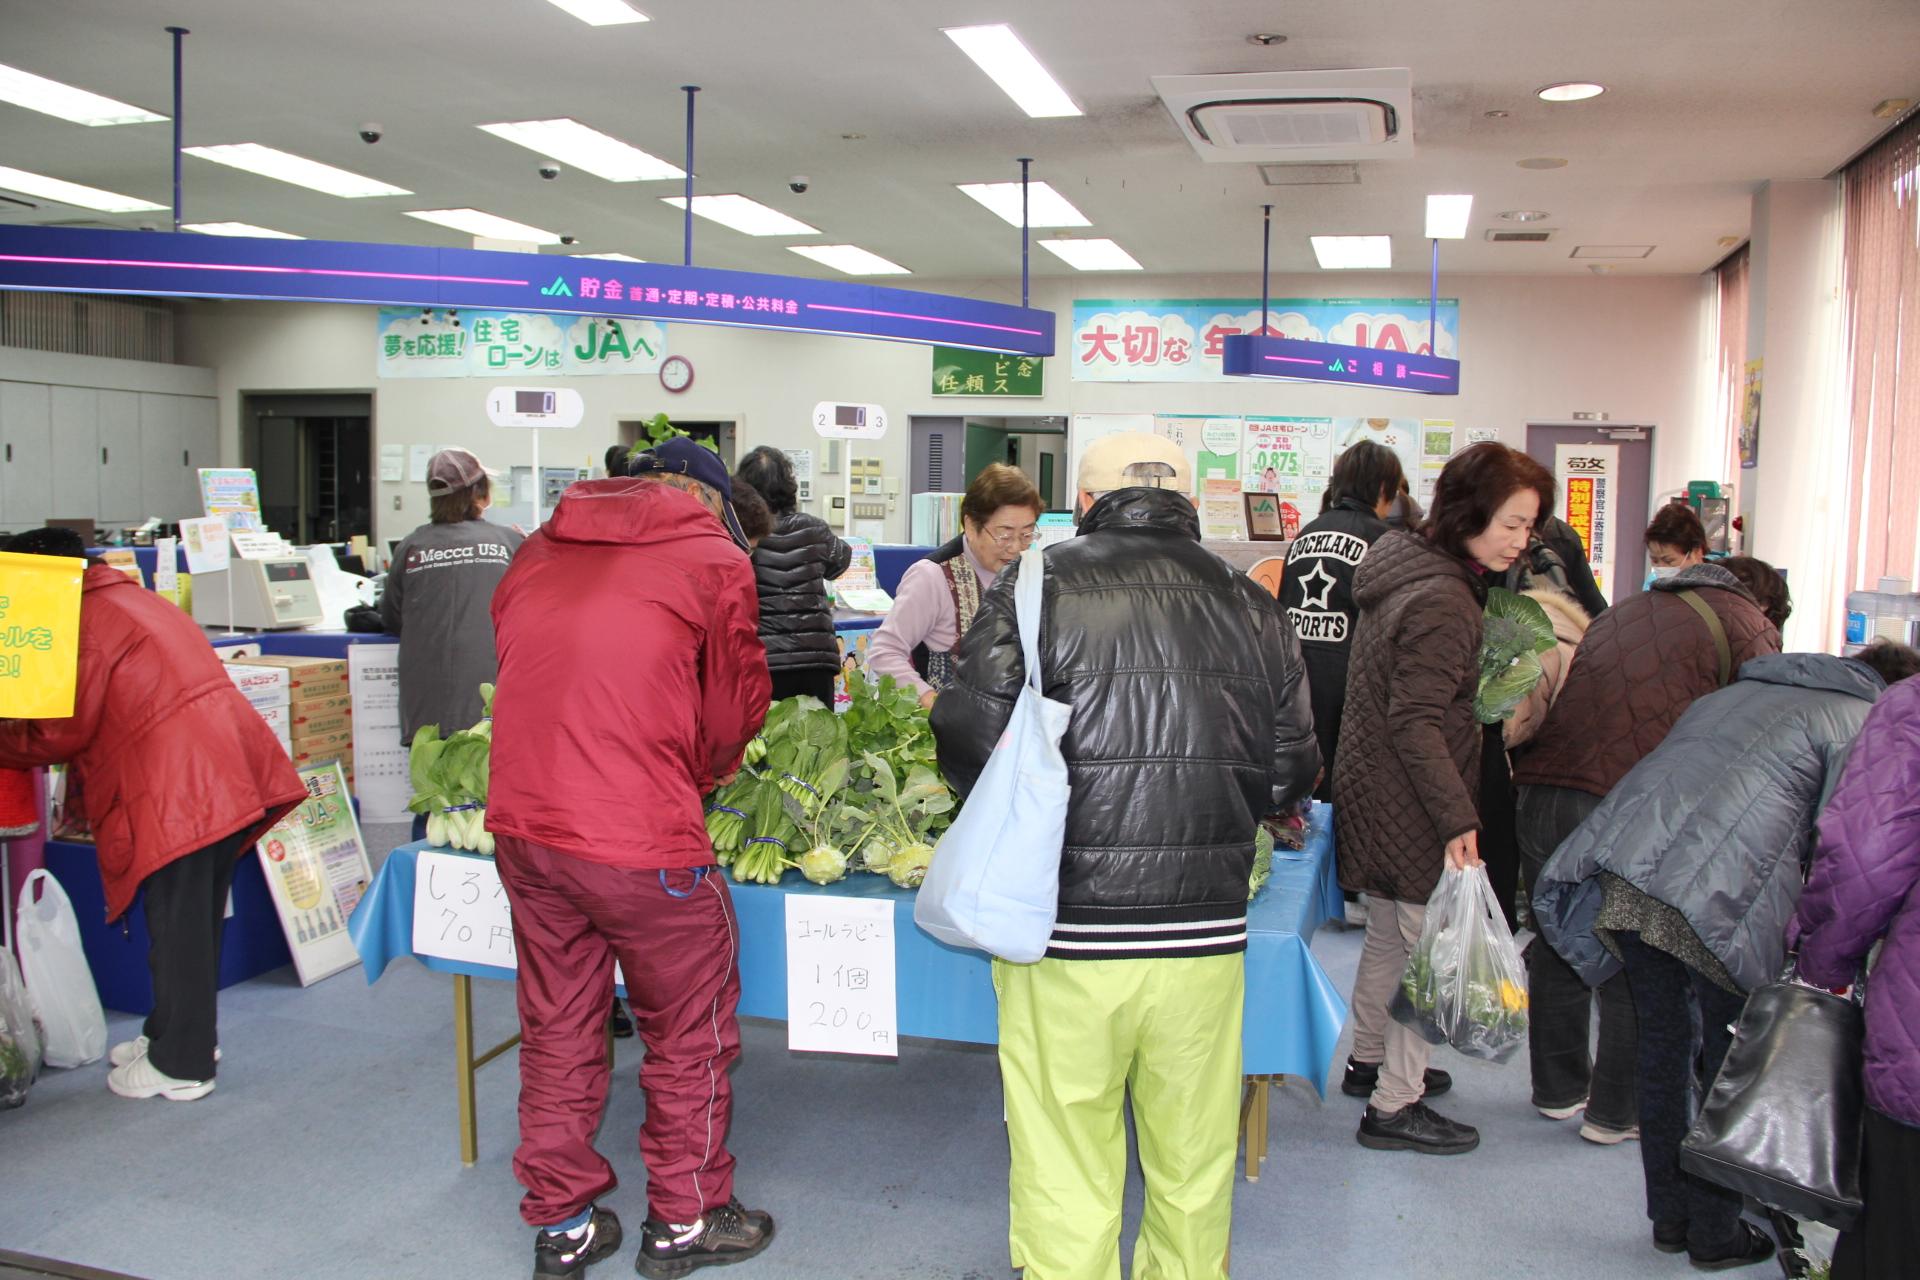 JA大阪市住吉支店 感謝日即売会の写真